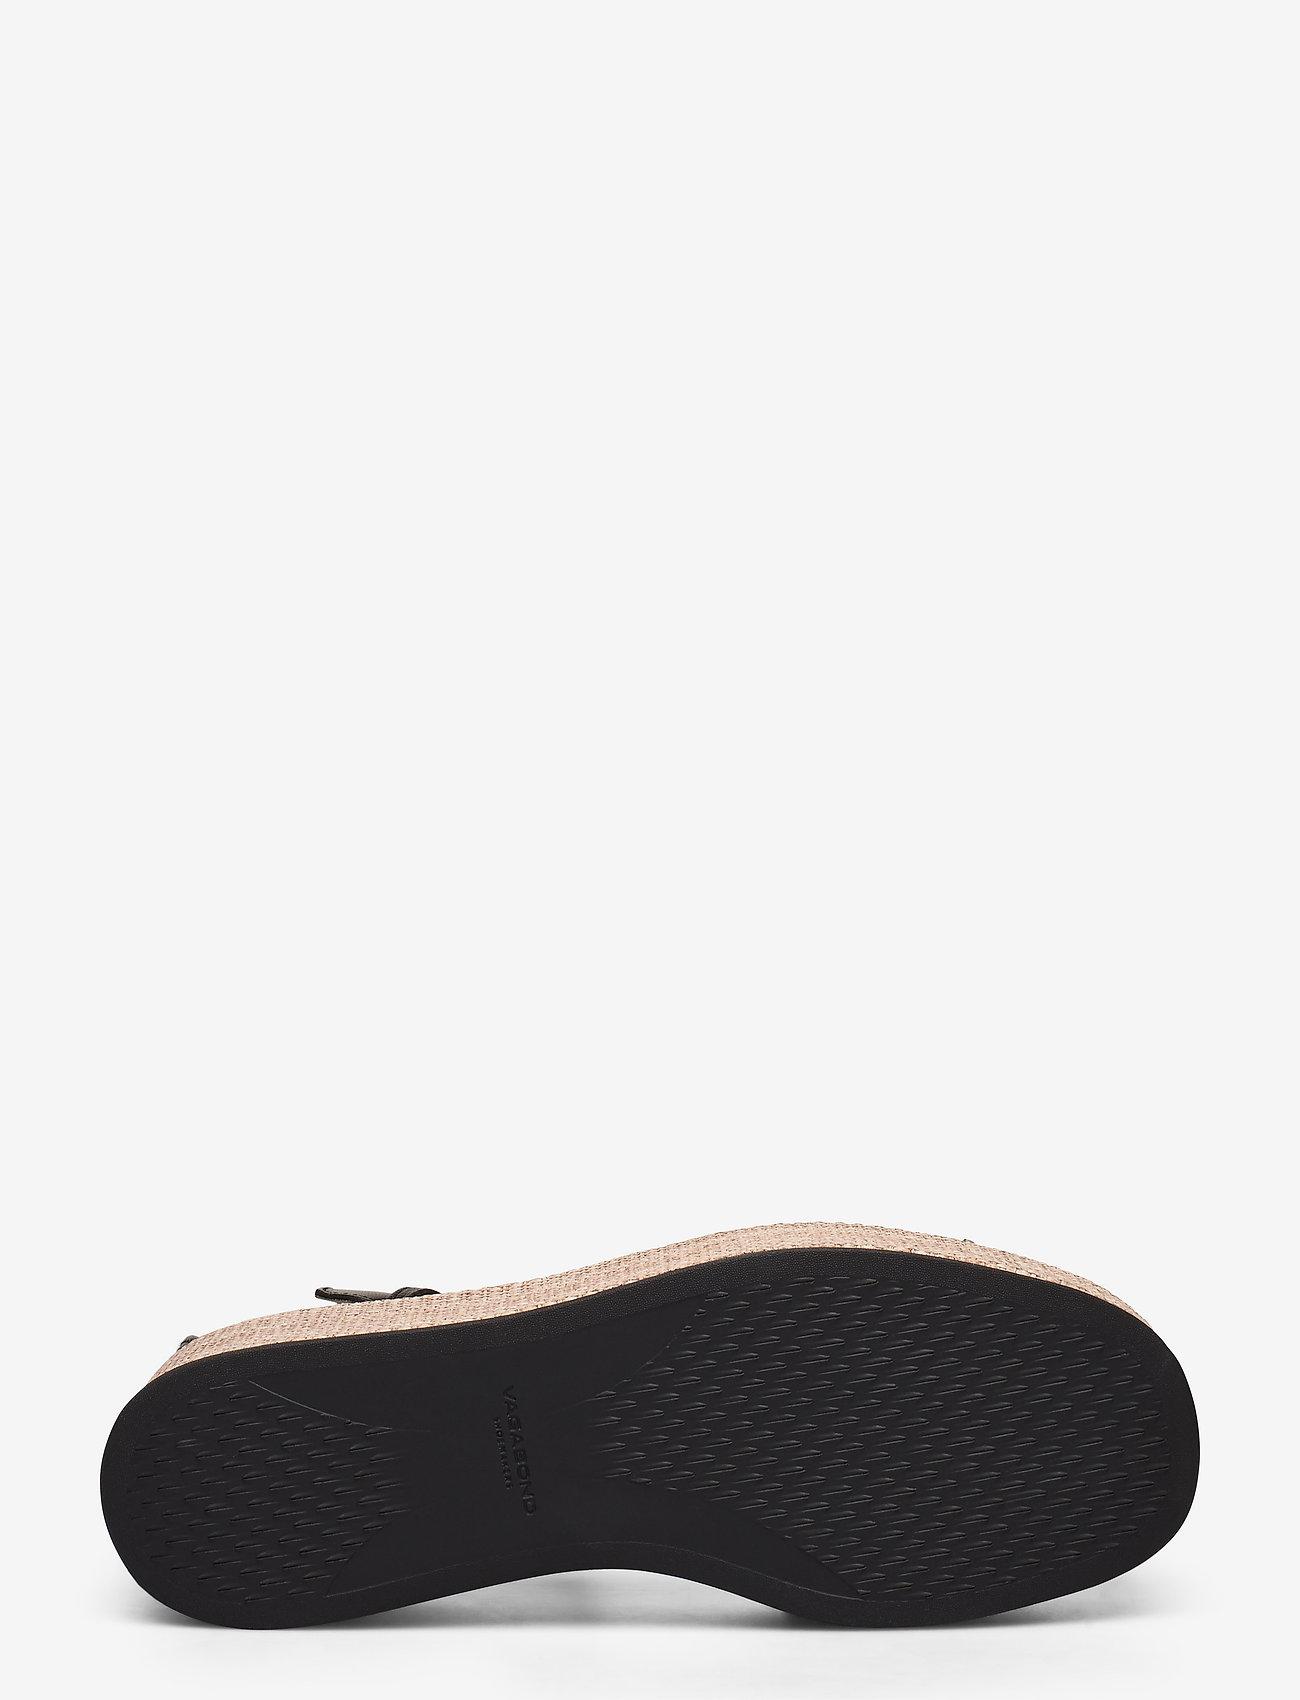 VAGABOND - FELICIA - heeled espadrilles - black - 4